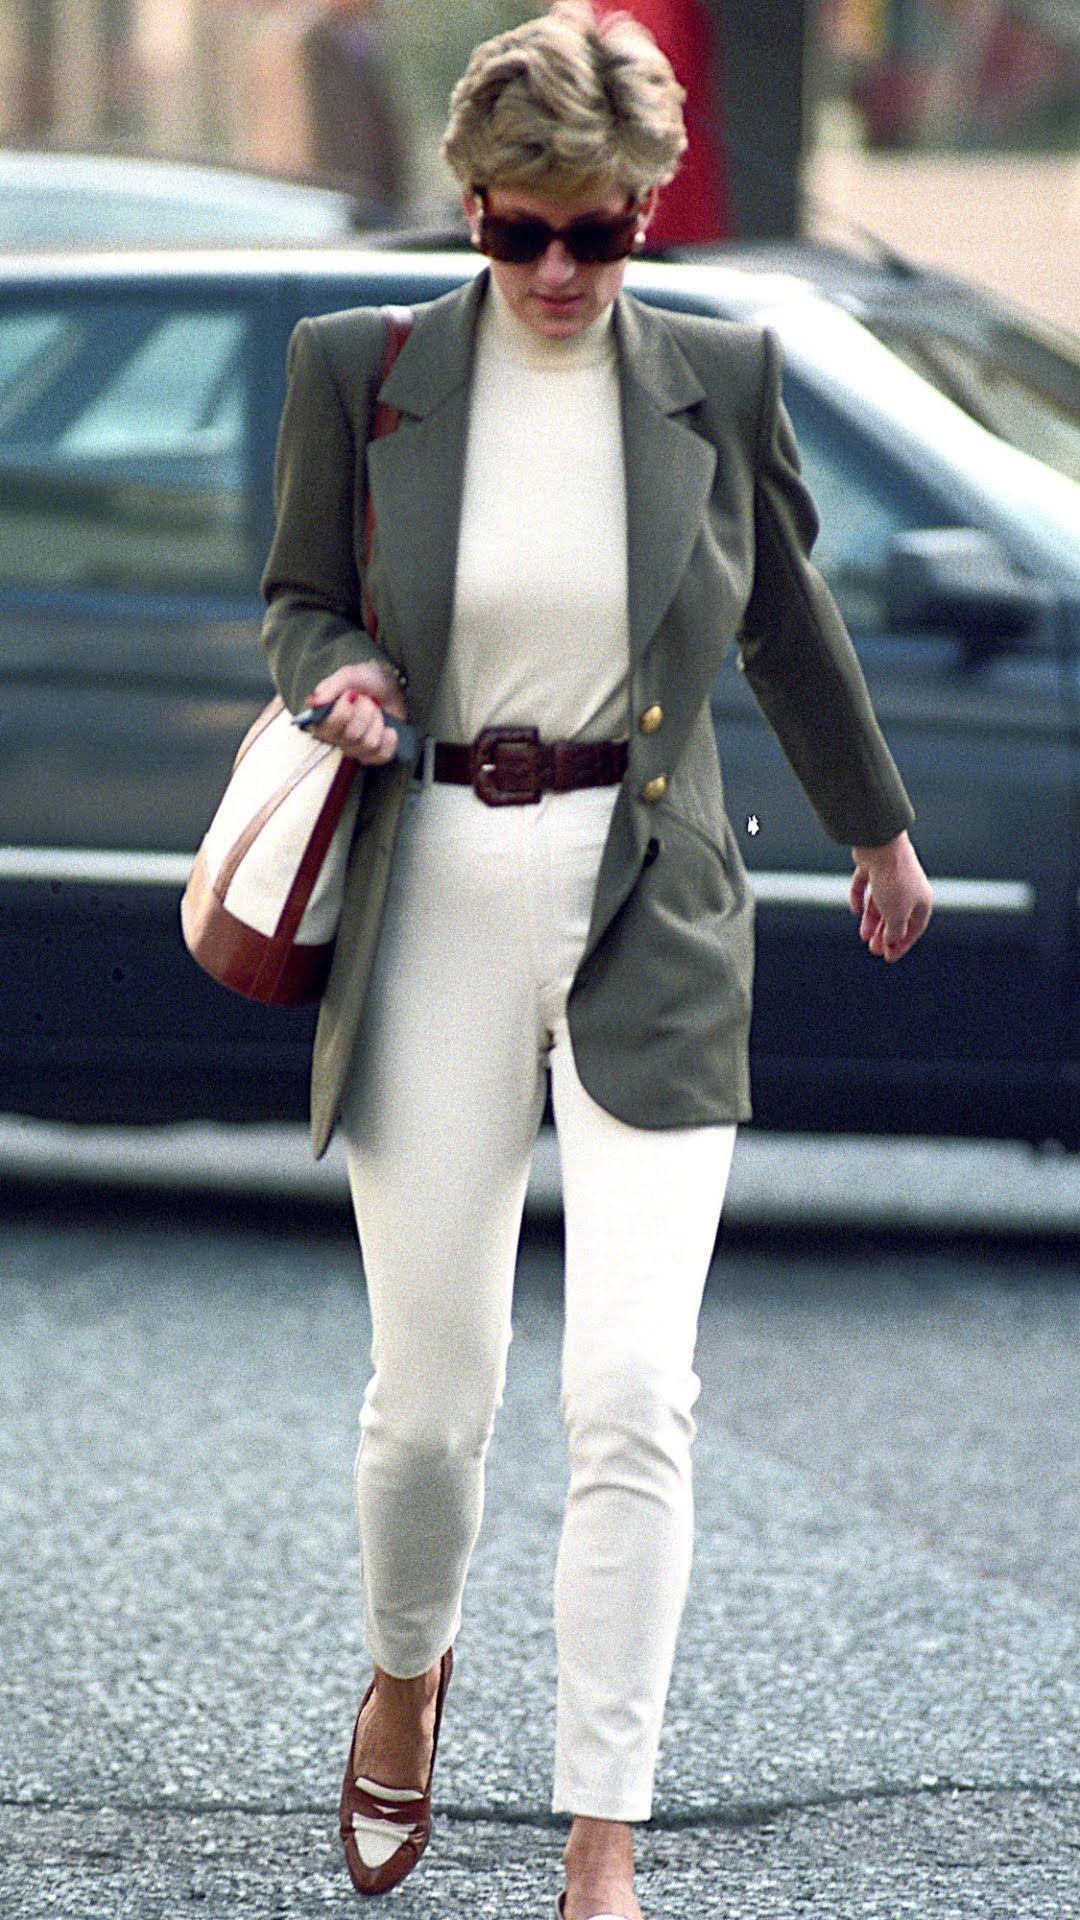 diana-fashion-style-transformation-embed-04c.jpg